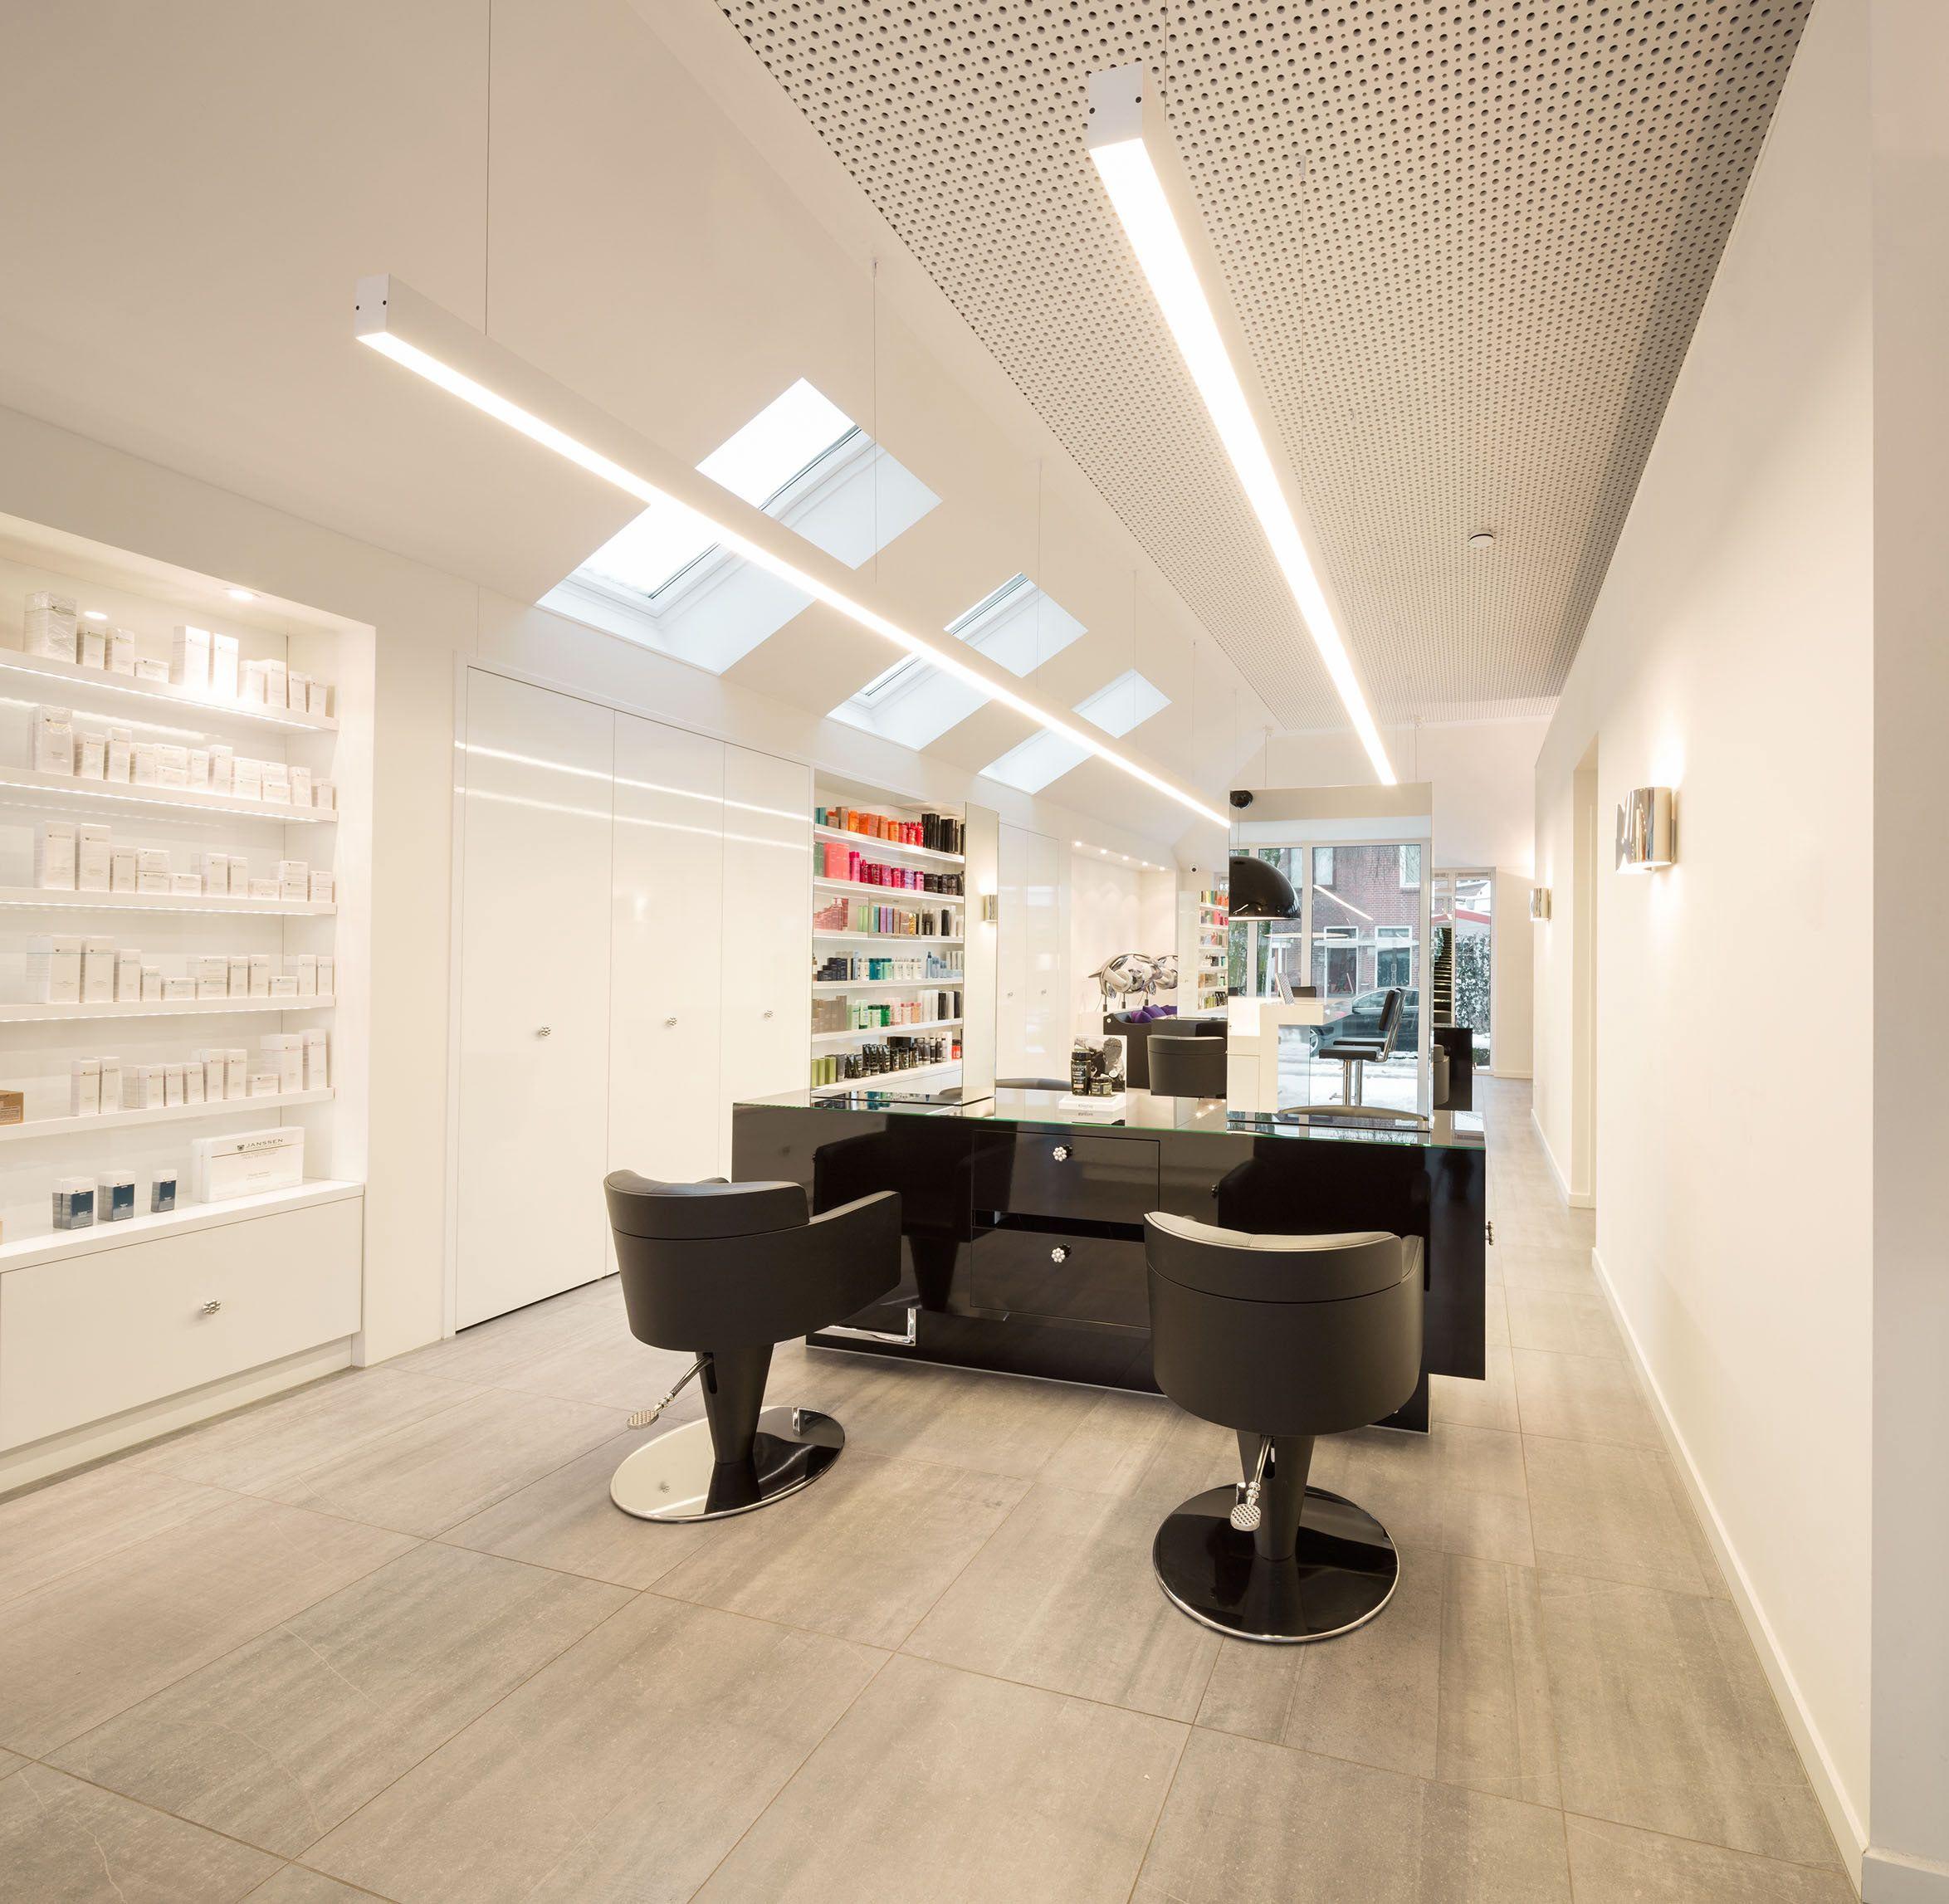 Inspiring Lighting Projects Sl75 Beauty Salon Furniture Modular Healthy Dinner